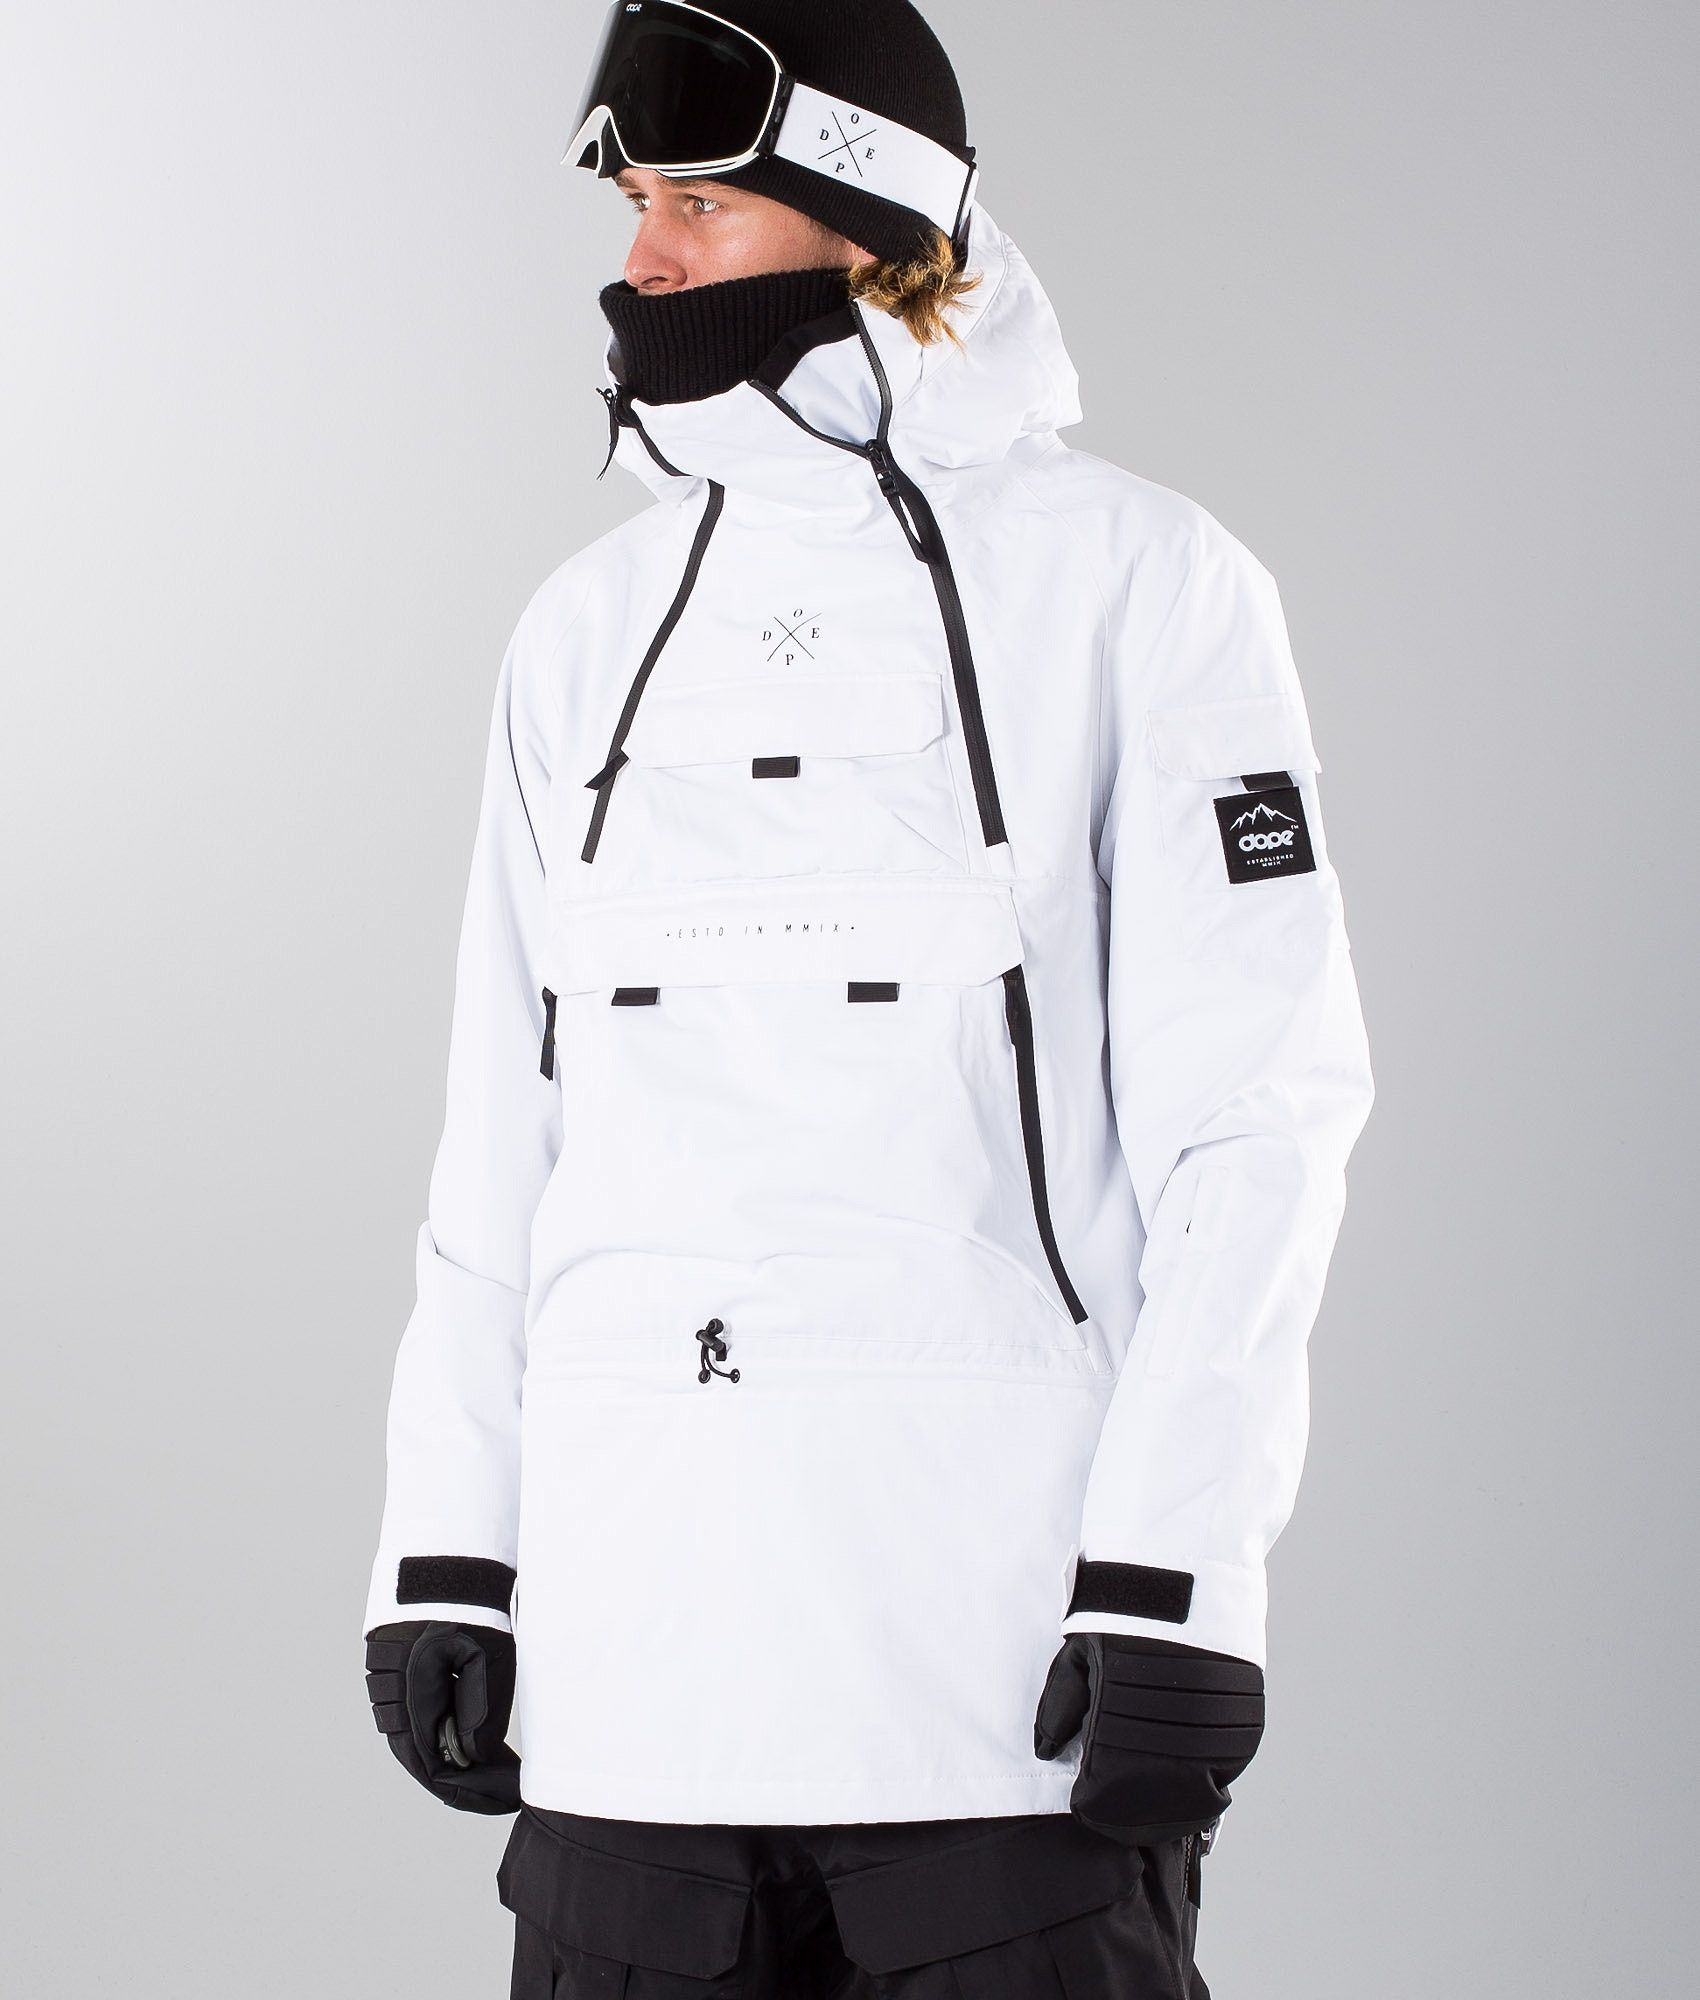 78cc3de0c79b Dope Adept Snowboard Jacket Black White